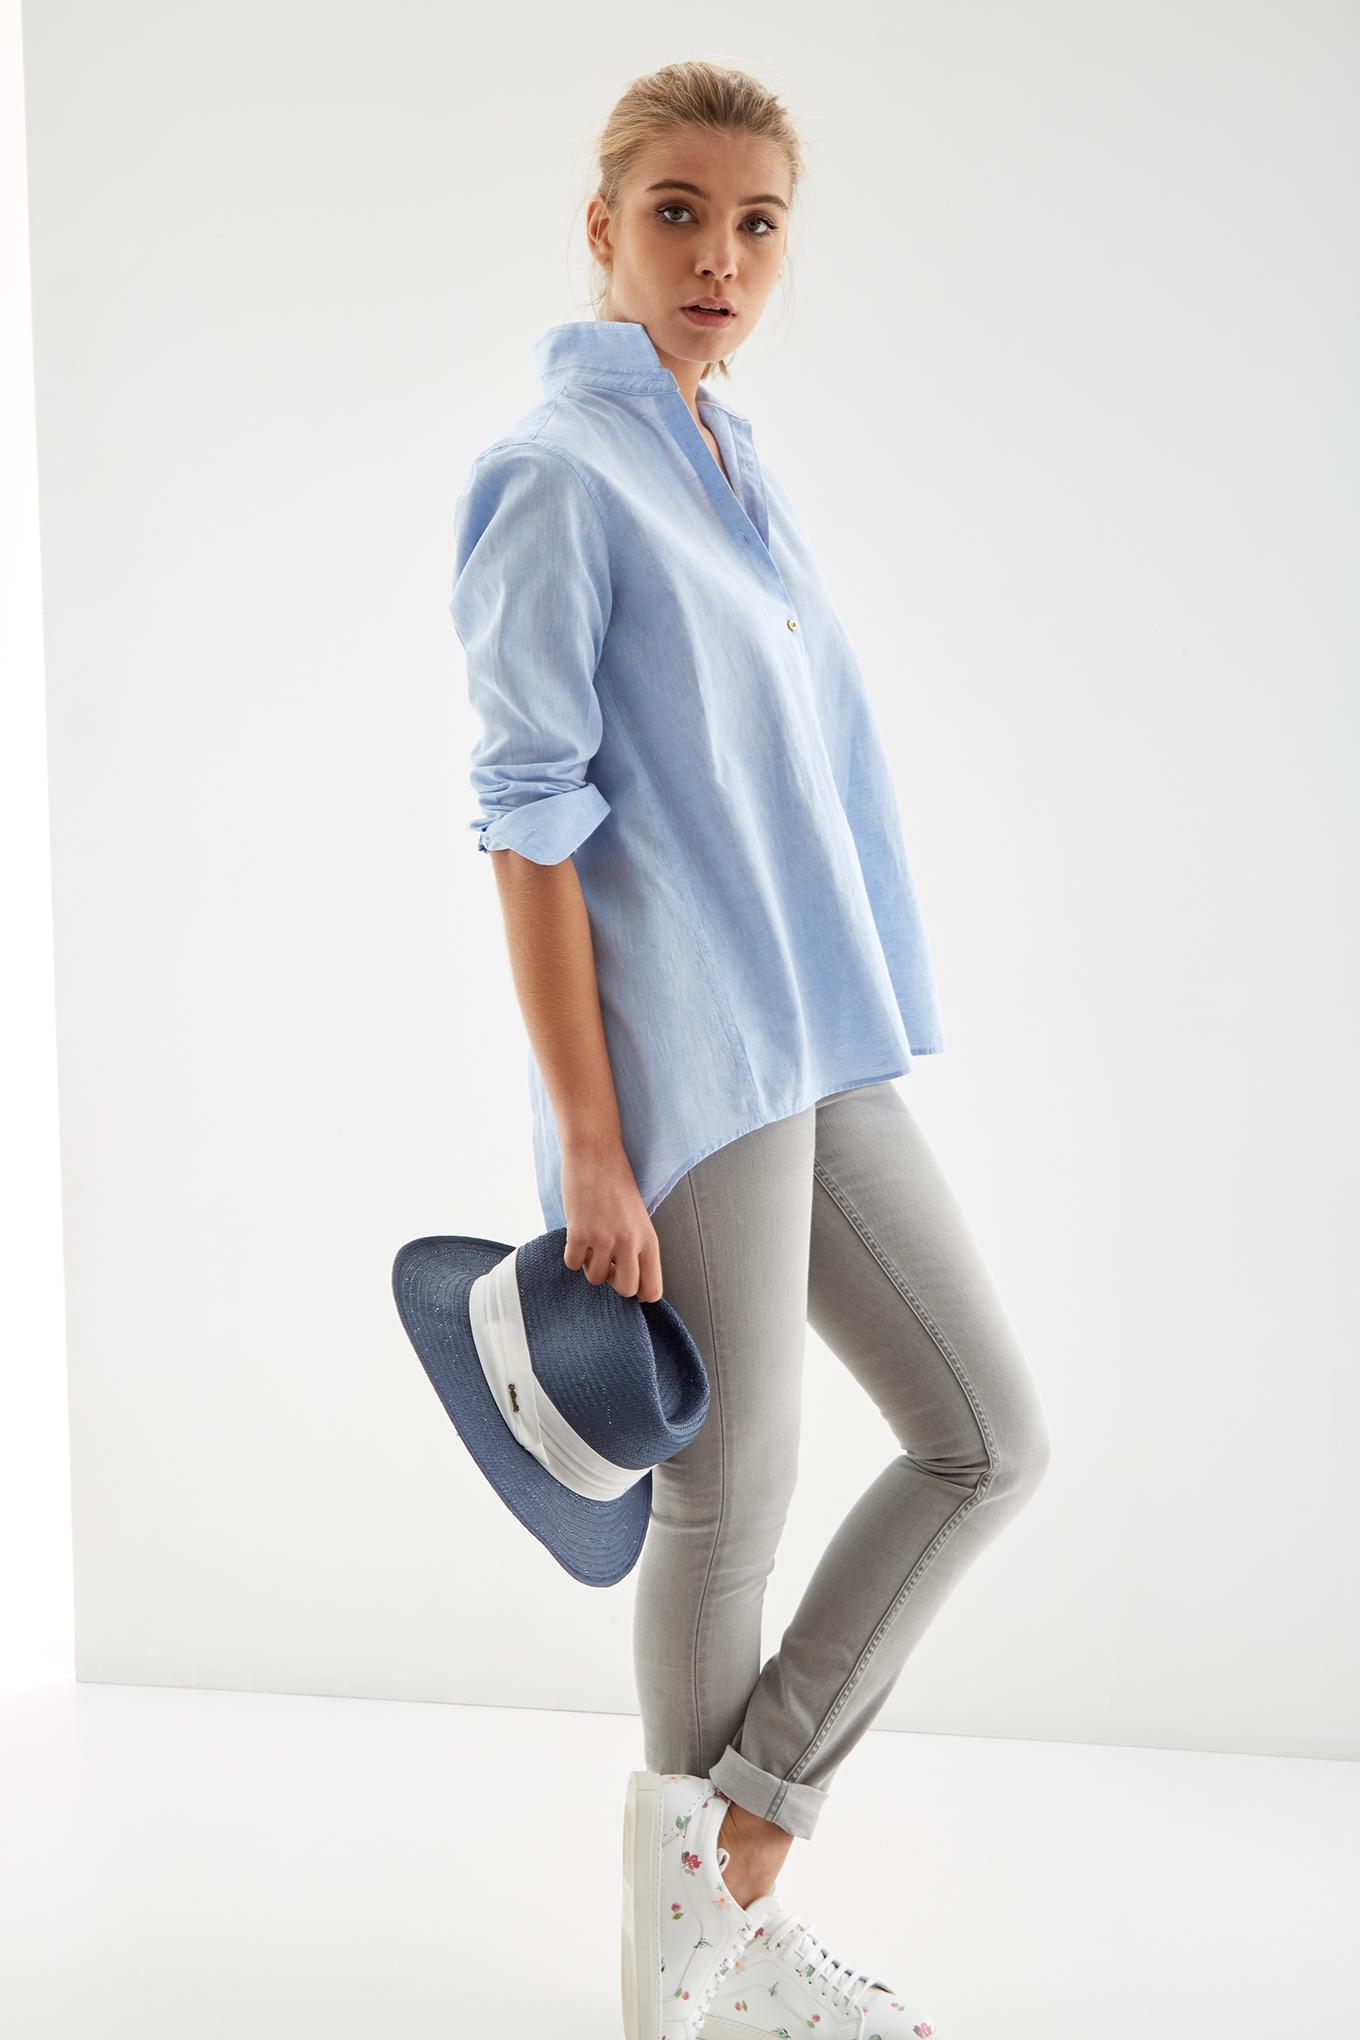 Blouse Light Blue Casual Woman